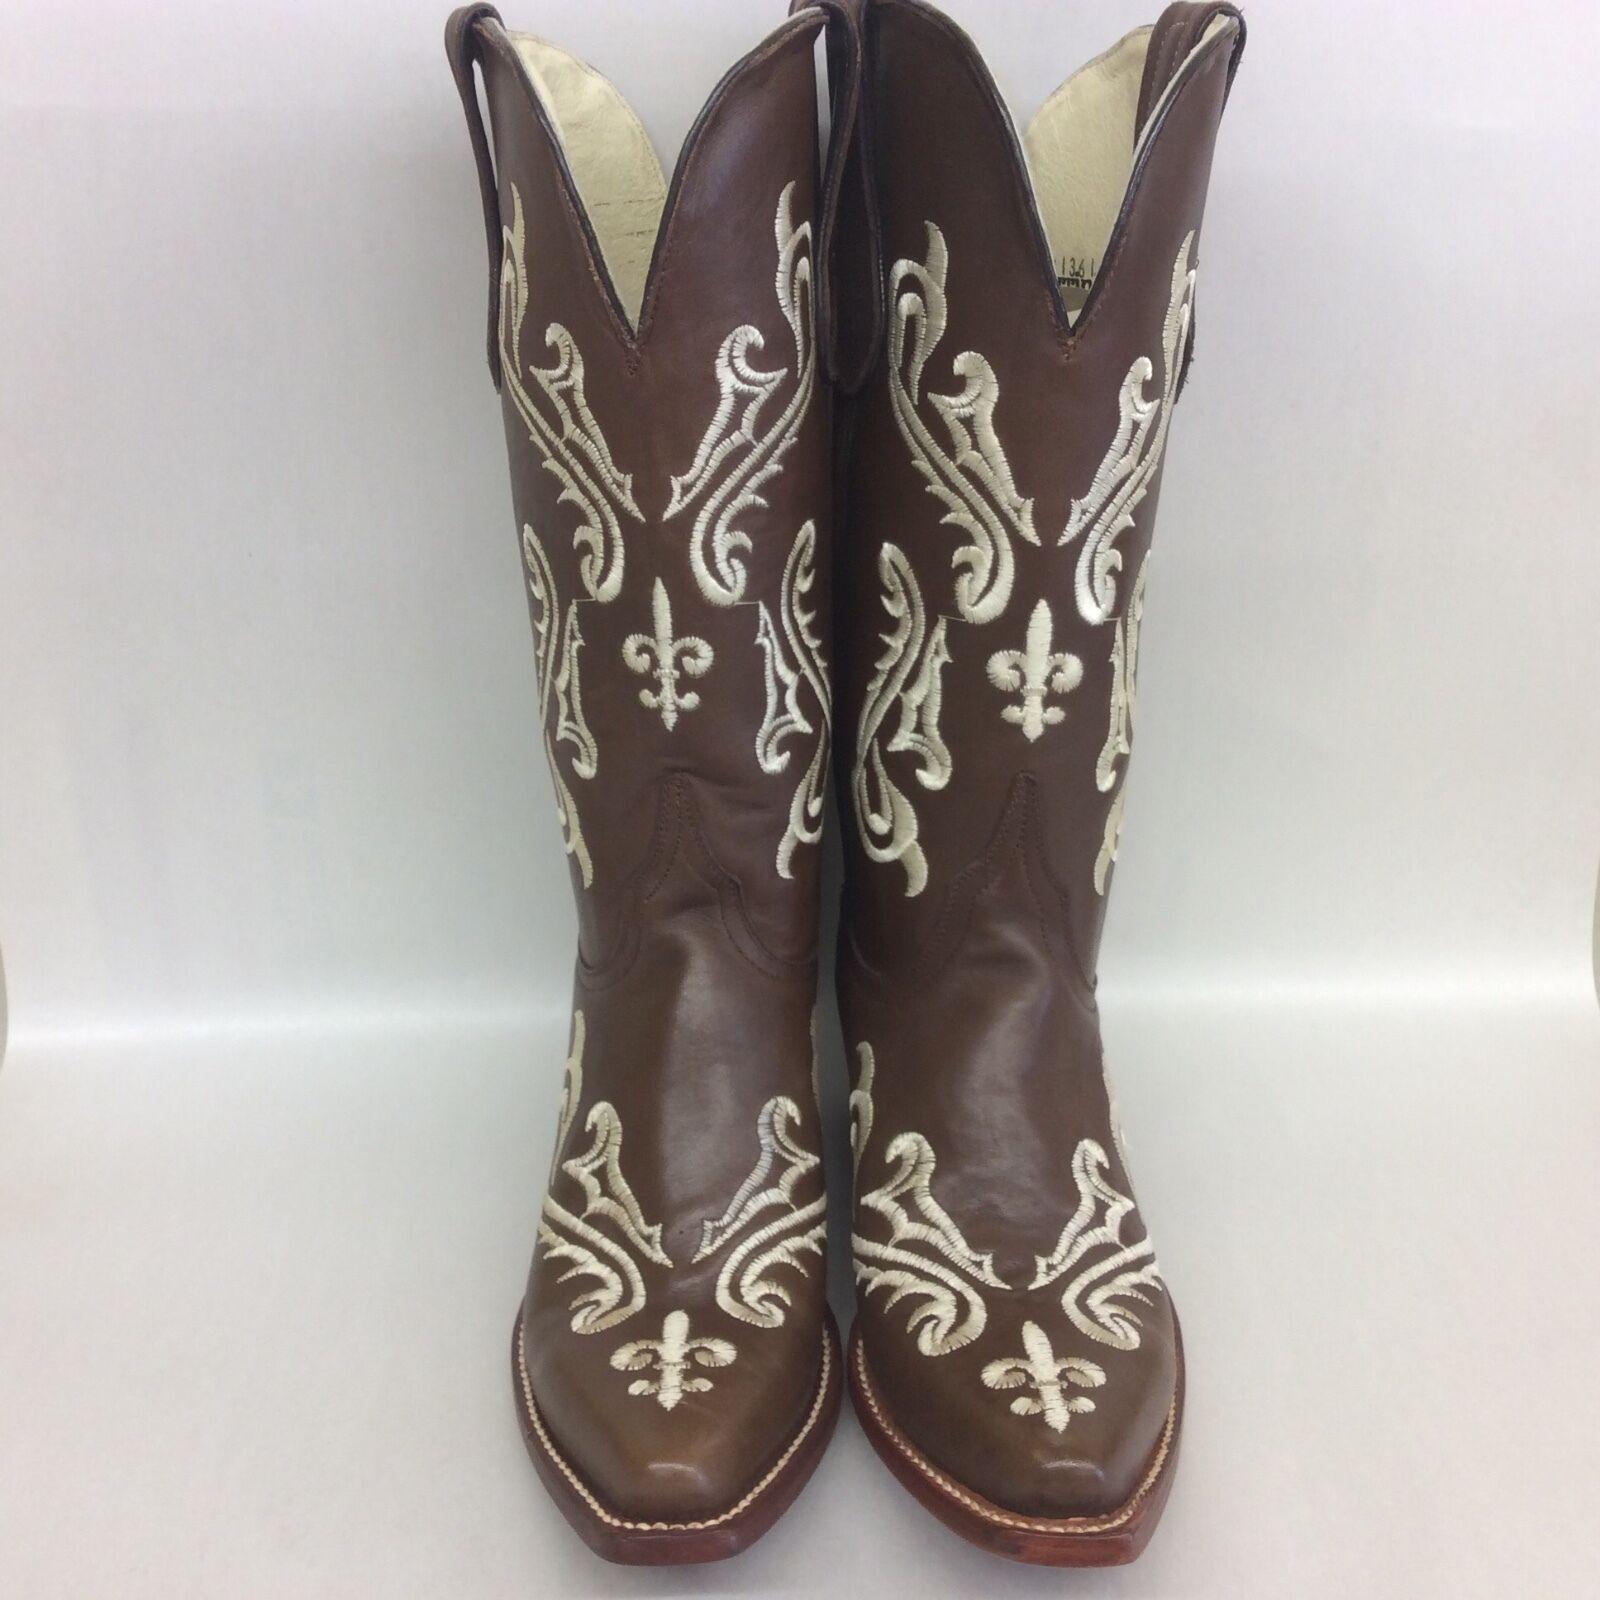 Ferrini Western Boots Women 8136110 Dark Brown White Size 7B